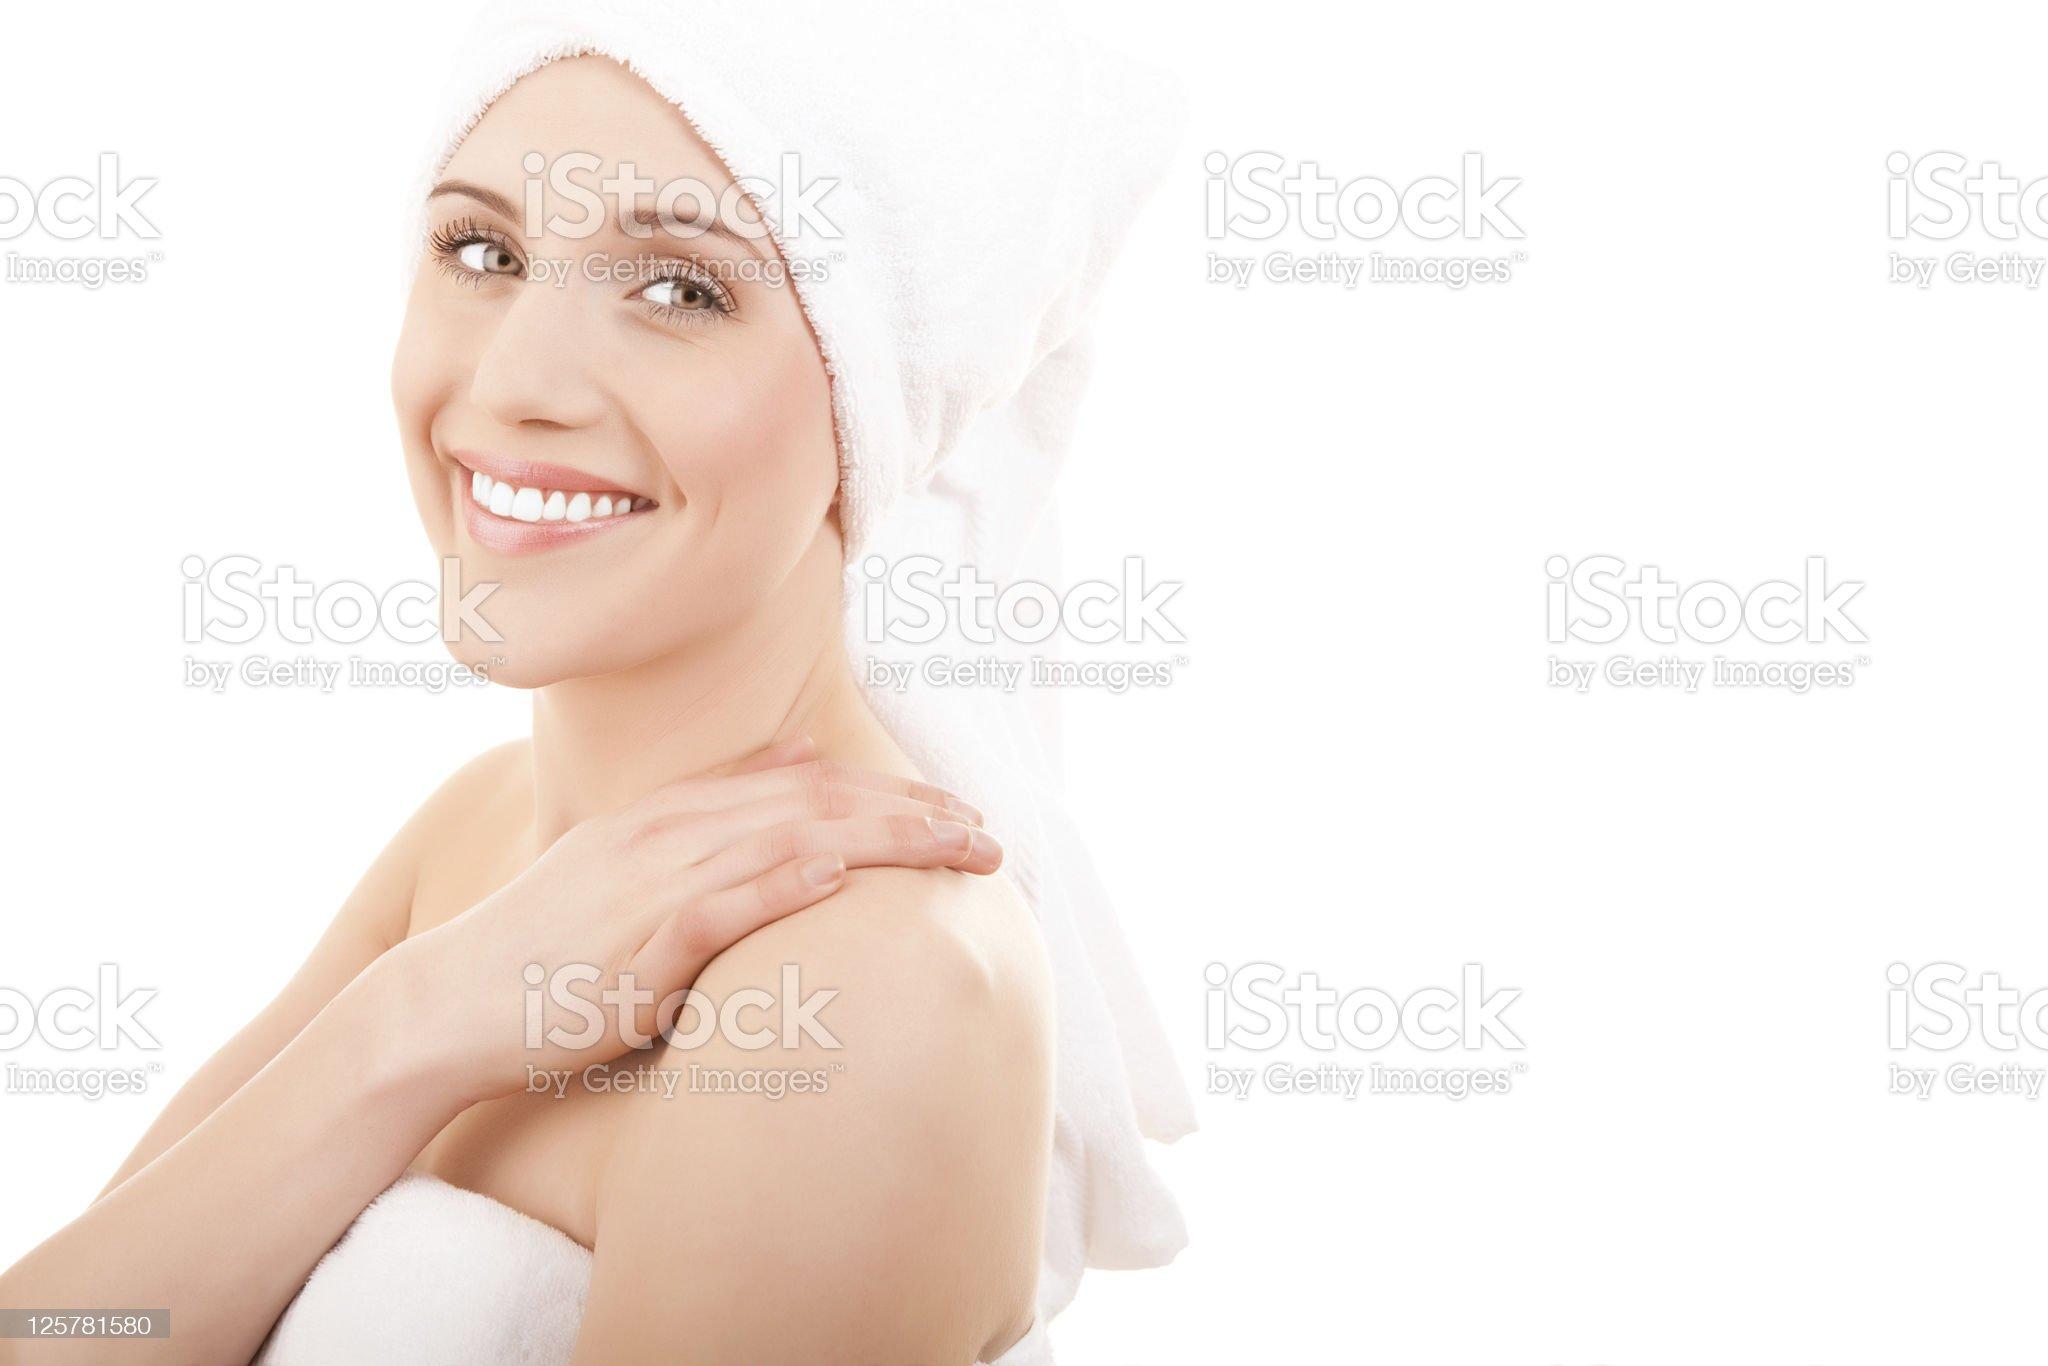 Smiling woman wearing bath towel royalty-free stock photo